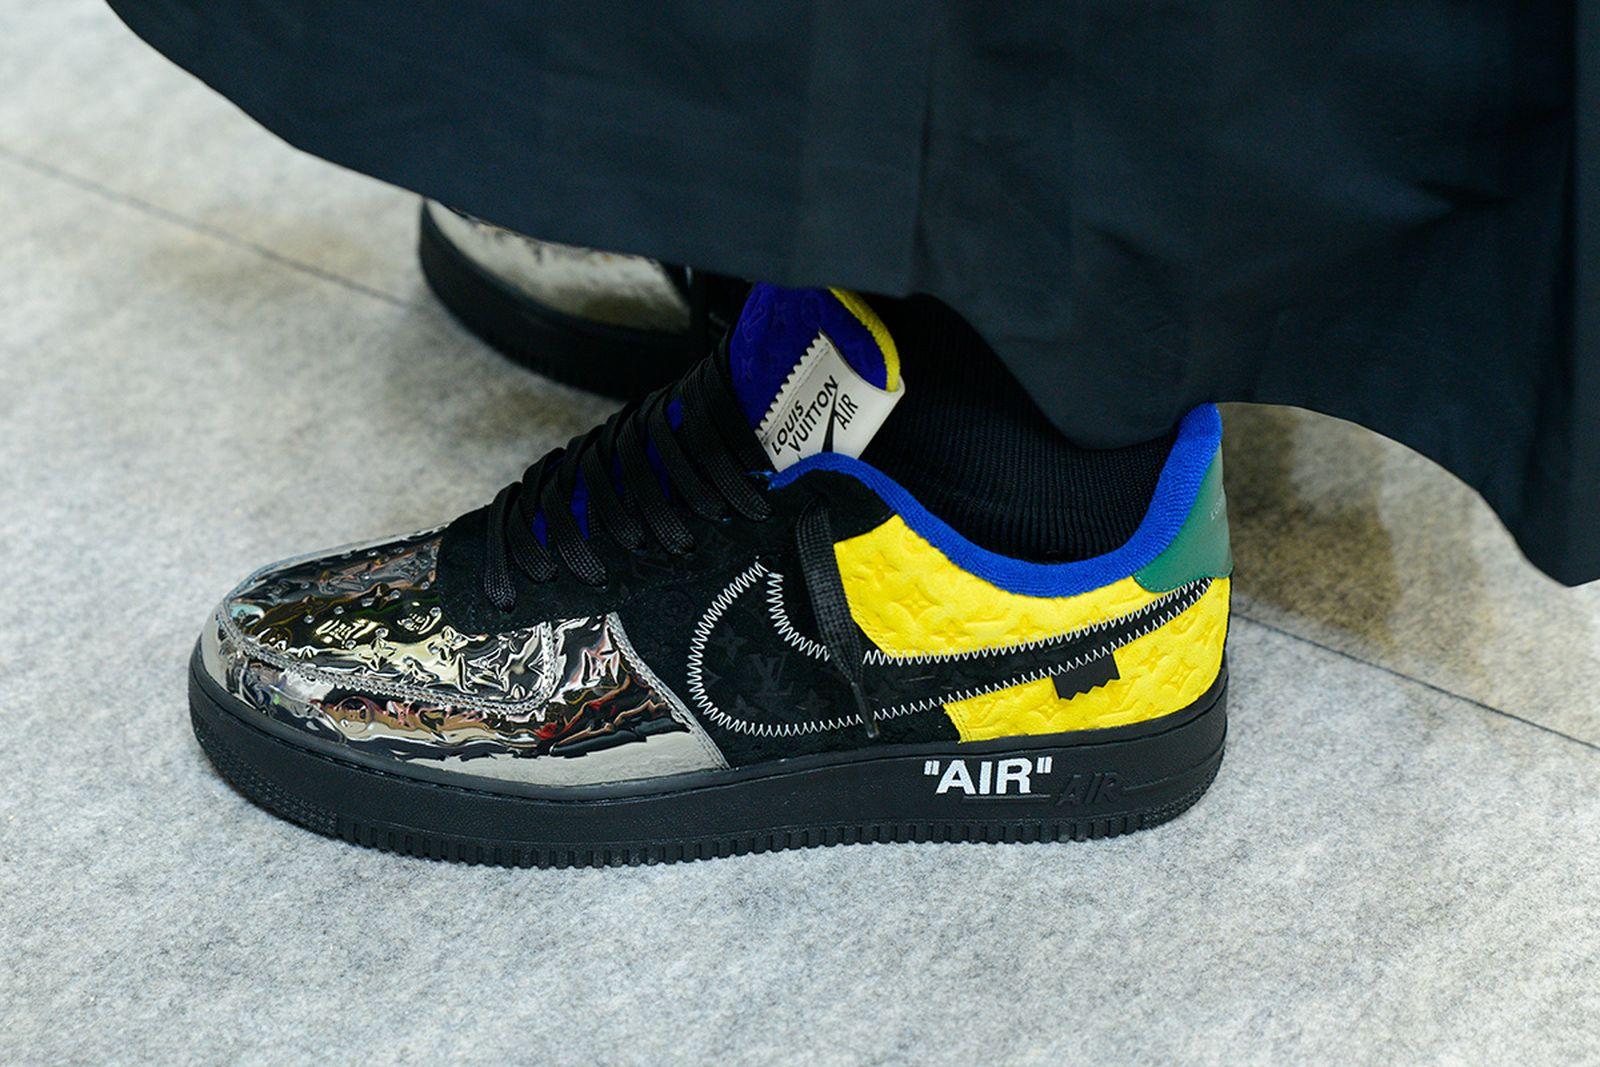 louis-vuitton-nike-virgil-abloh-sneaker-reveal-14